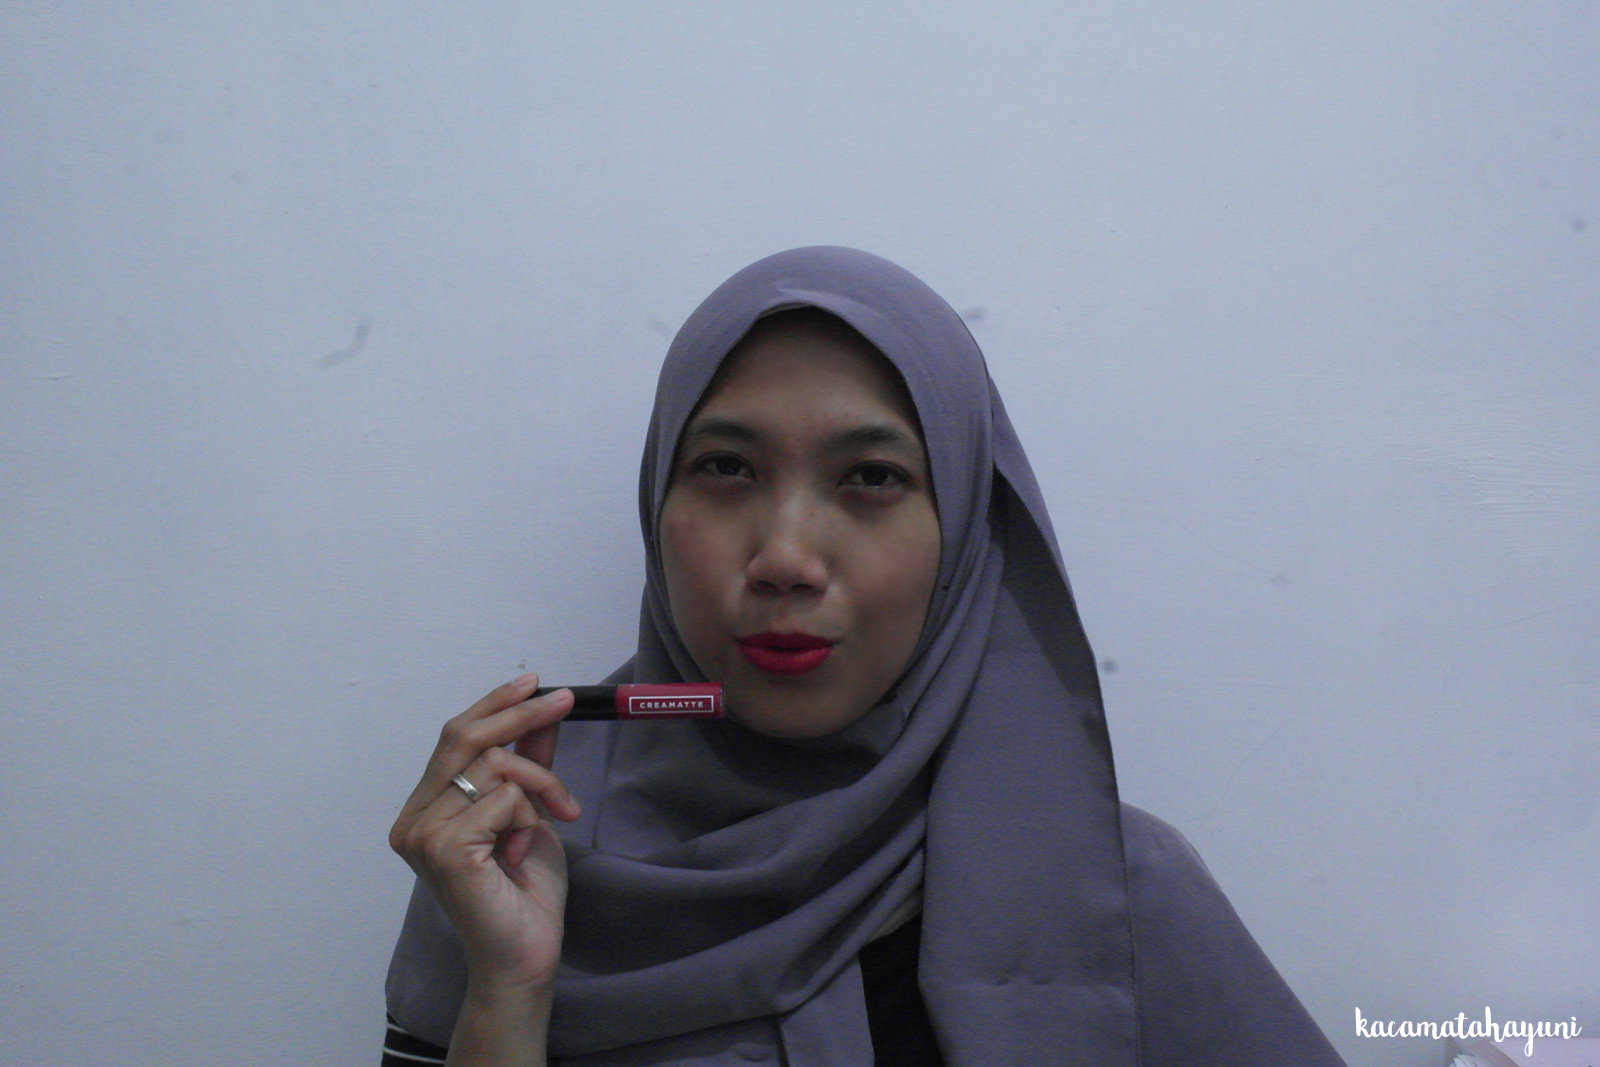 Kacamata Hayuni Review Matte Lipstick Lokal Murah Emina